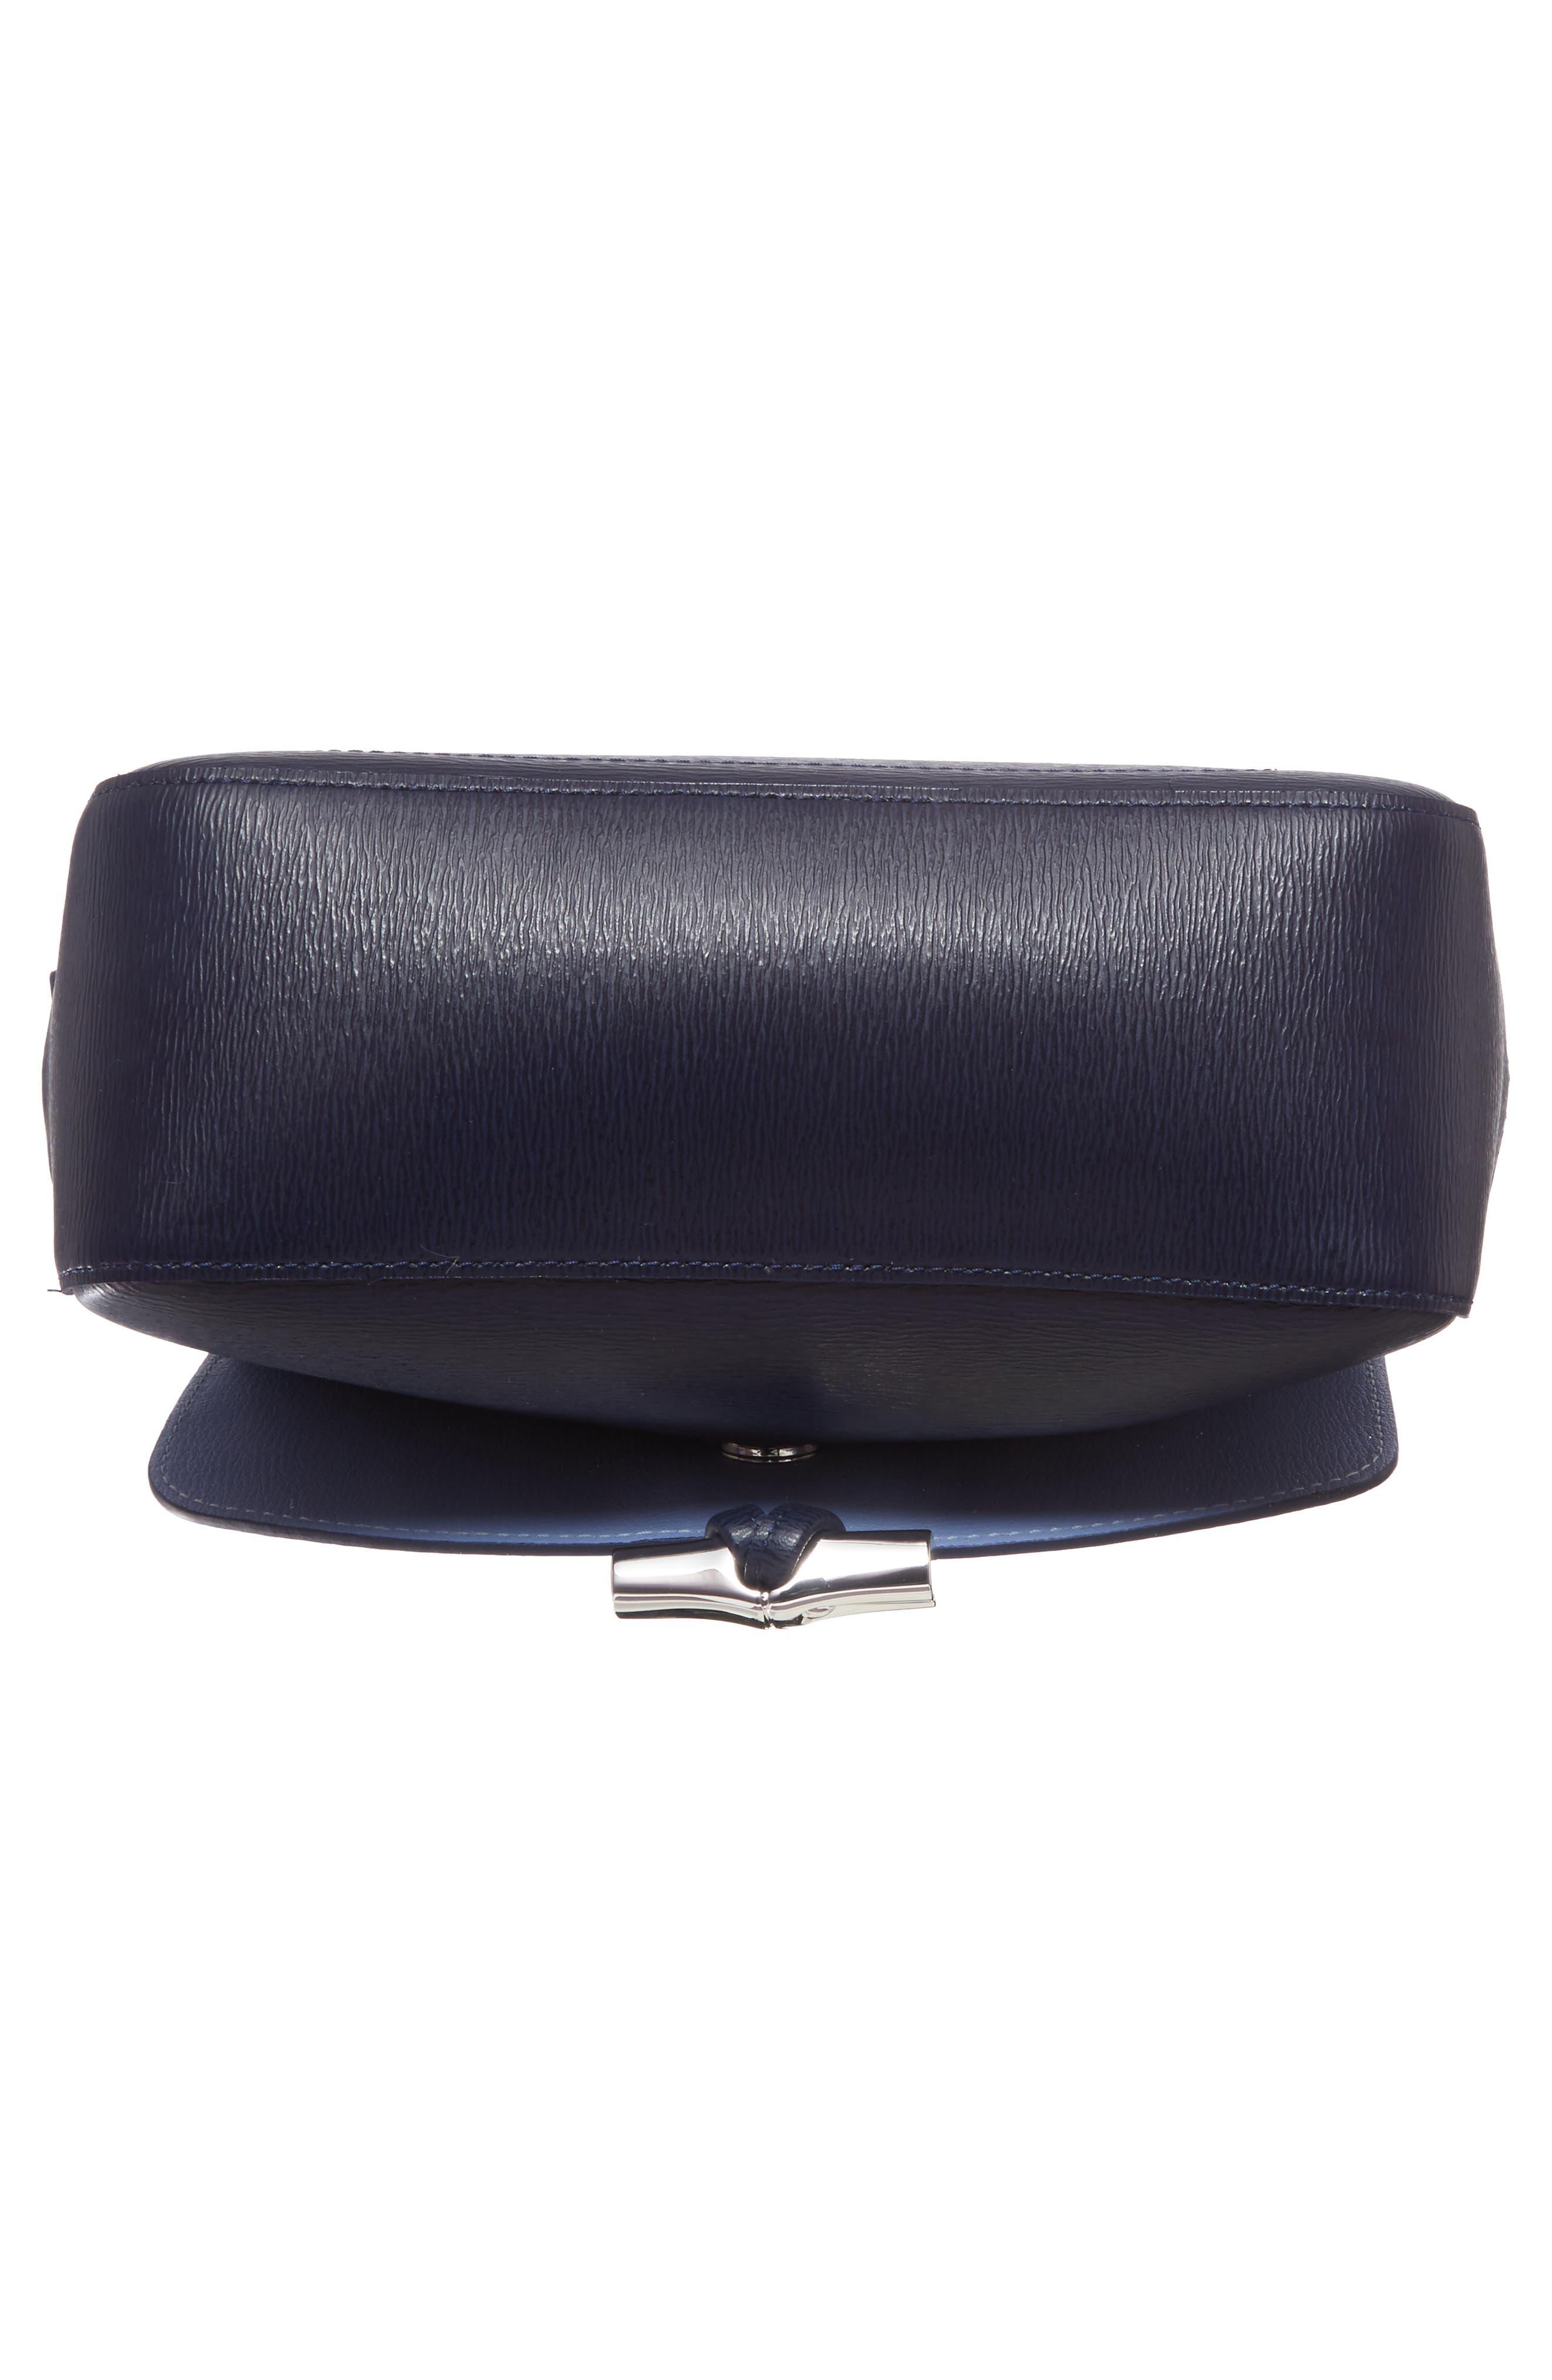 Roseau Leather Crossbody Bag,                             Alternate thumbnail 6, color,                             Navy